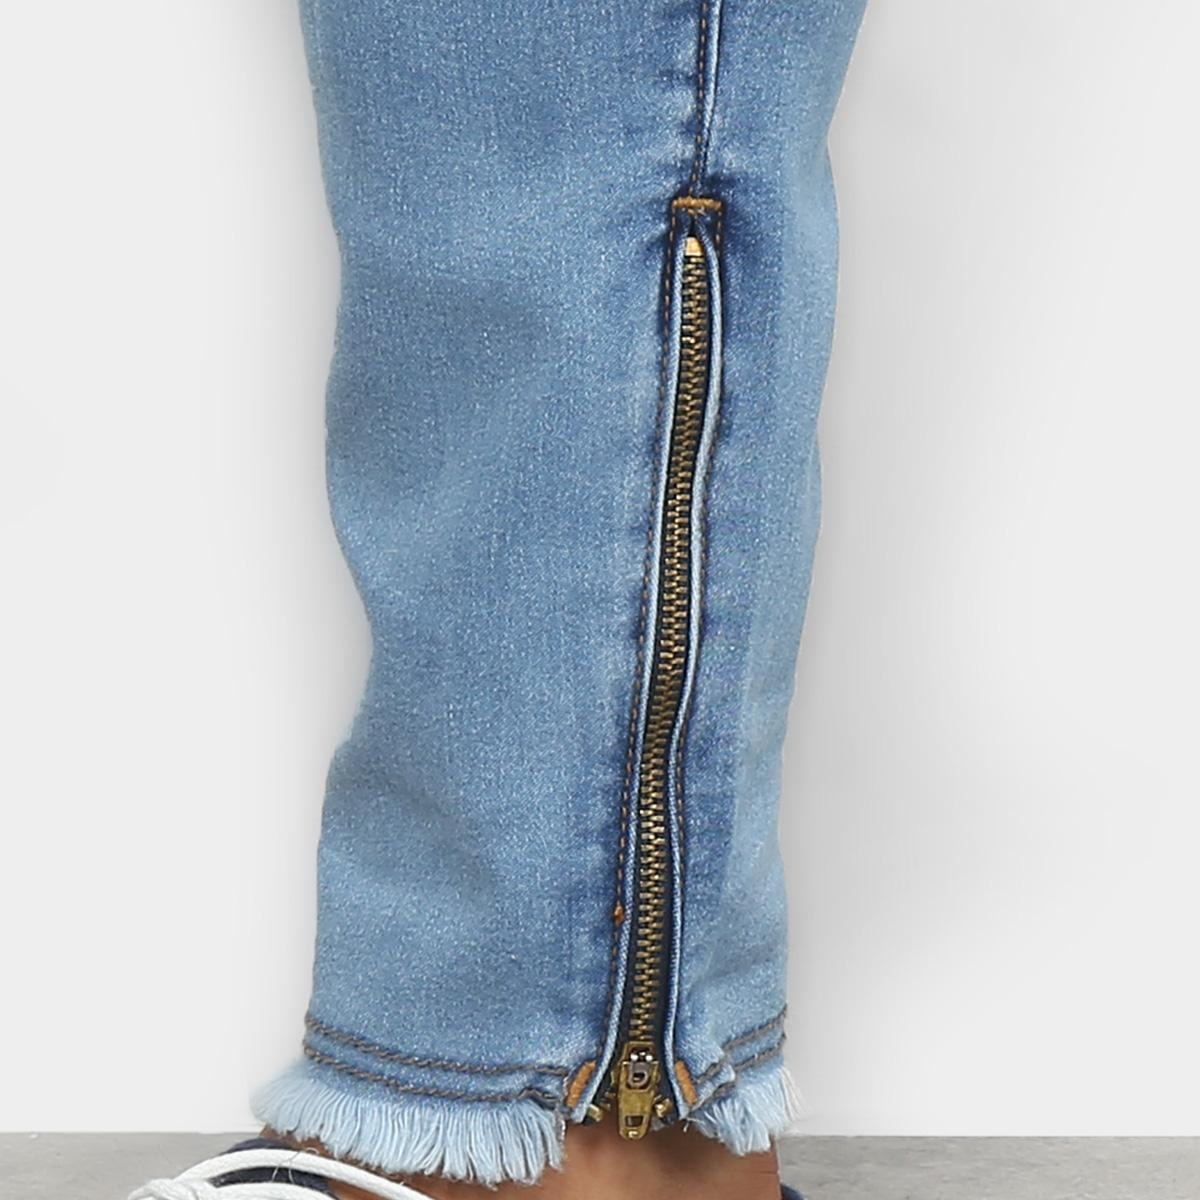 0972256d2 Calça Jeans Cropped Preston Destroyed Masculina - R$ 149,99 em ...